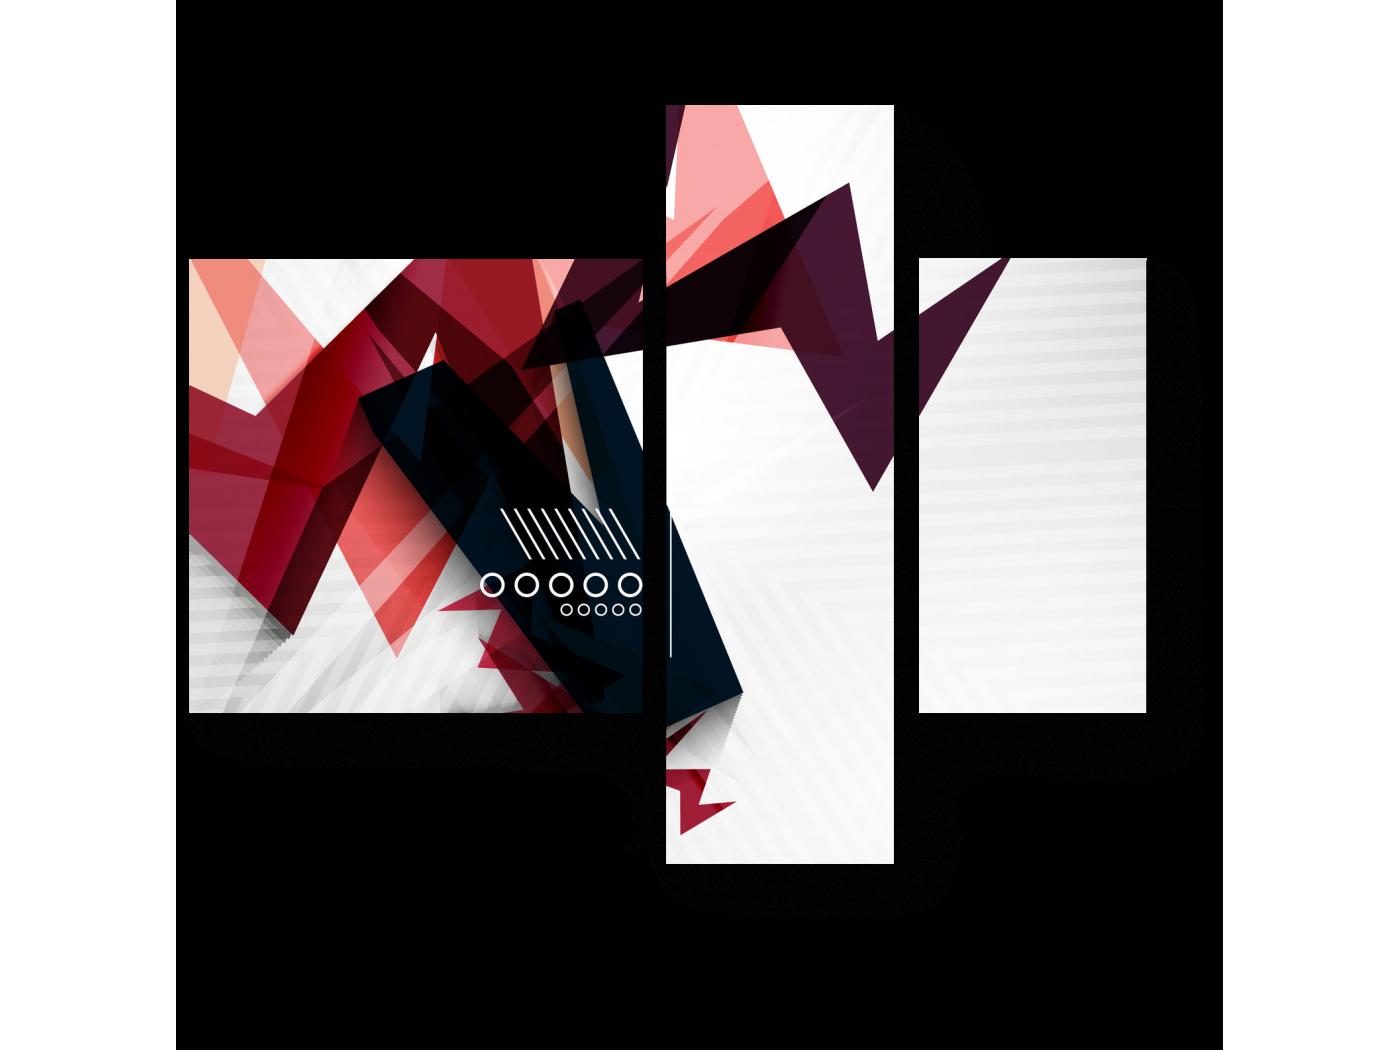 Модульная картина Молния цвета (80x66) фото